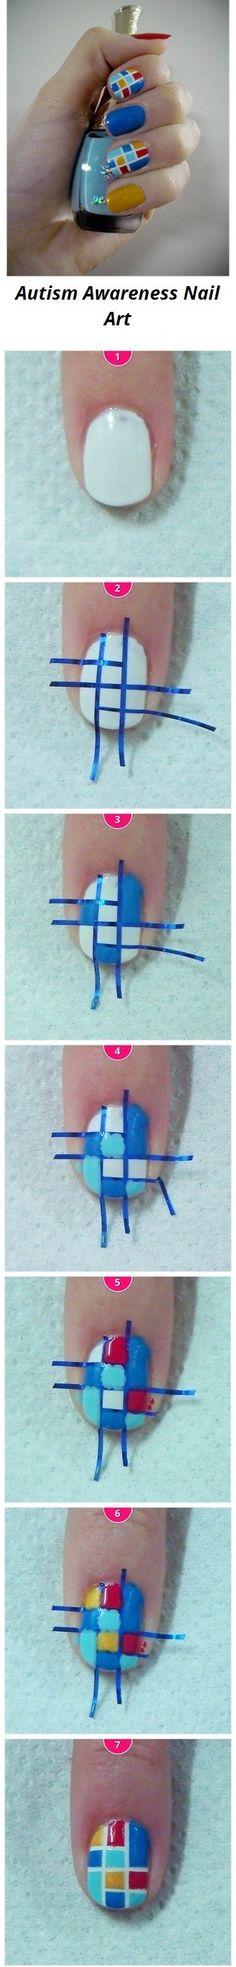 nail art#diy #howto #doityourself #livingwikii #diyrefashion #ideas #partymostess #tricks #home #tips